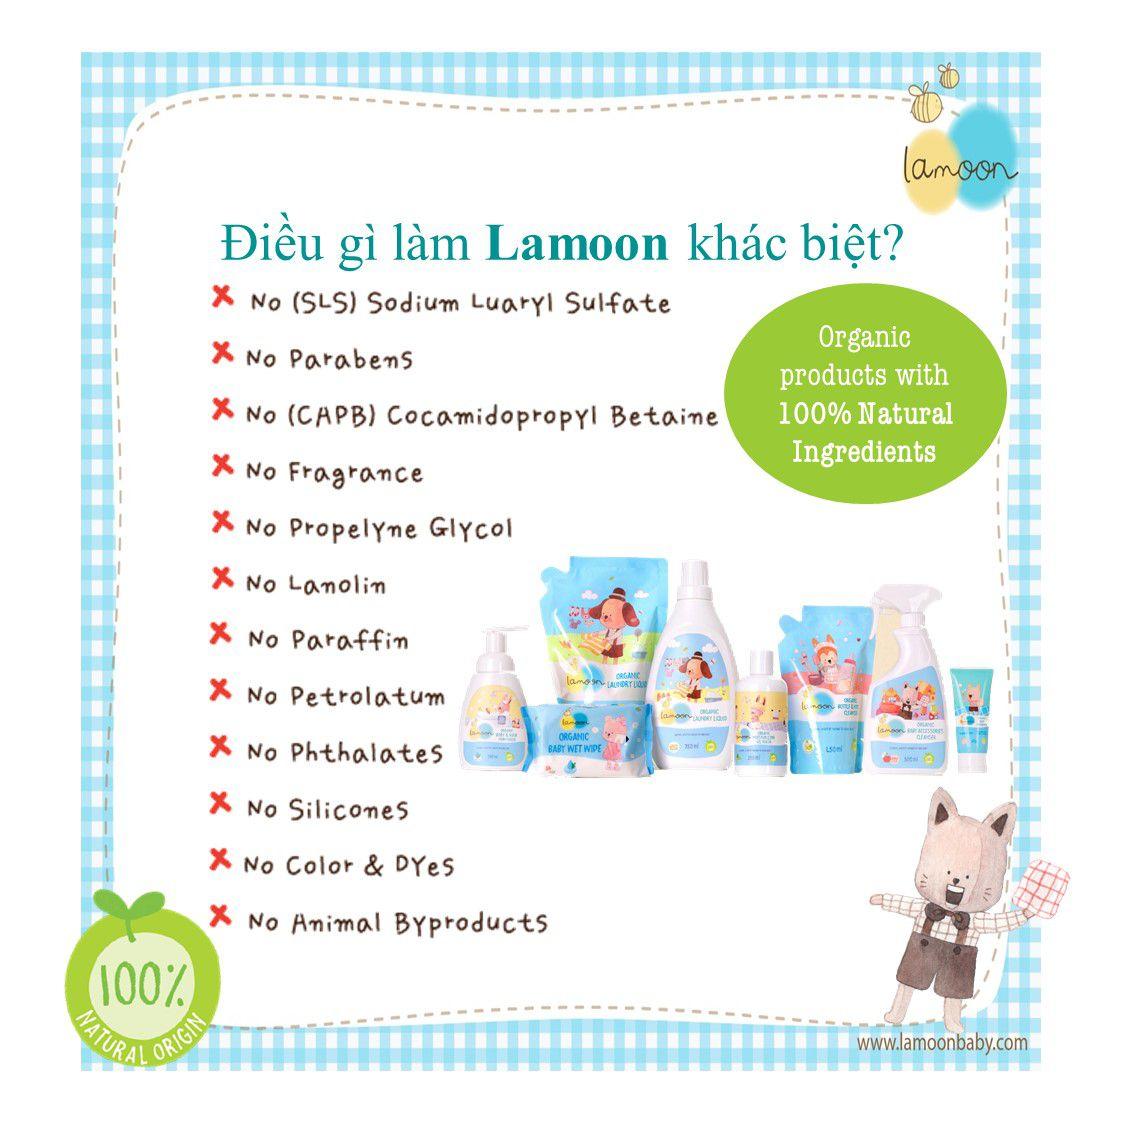 Lamoon